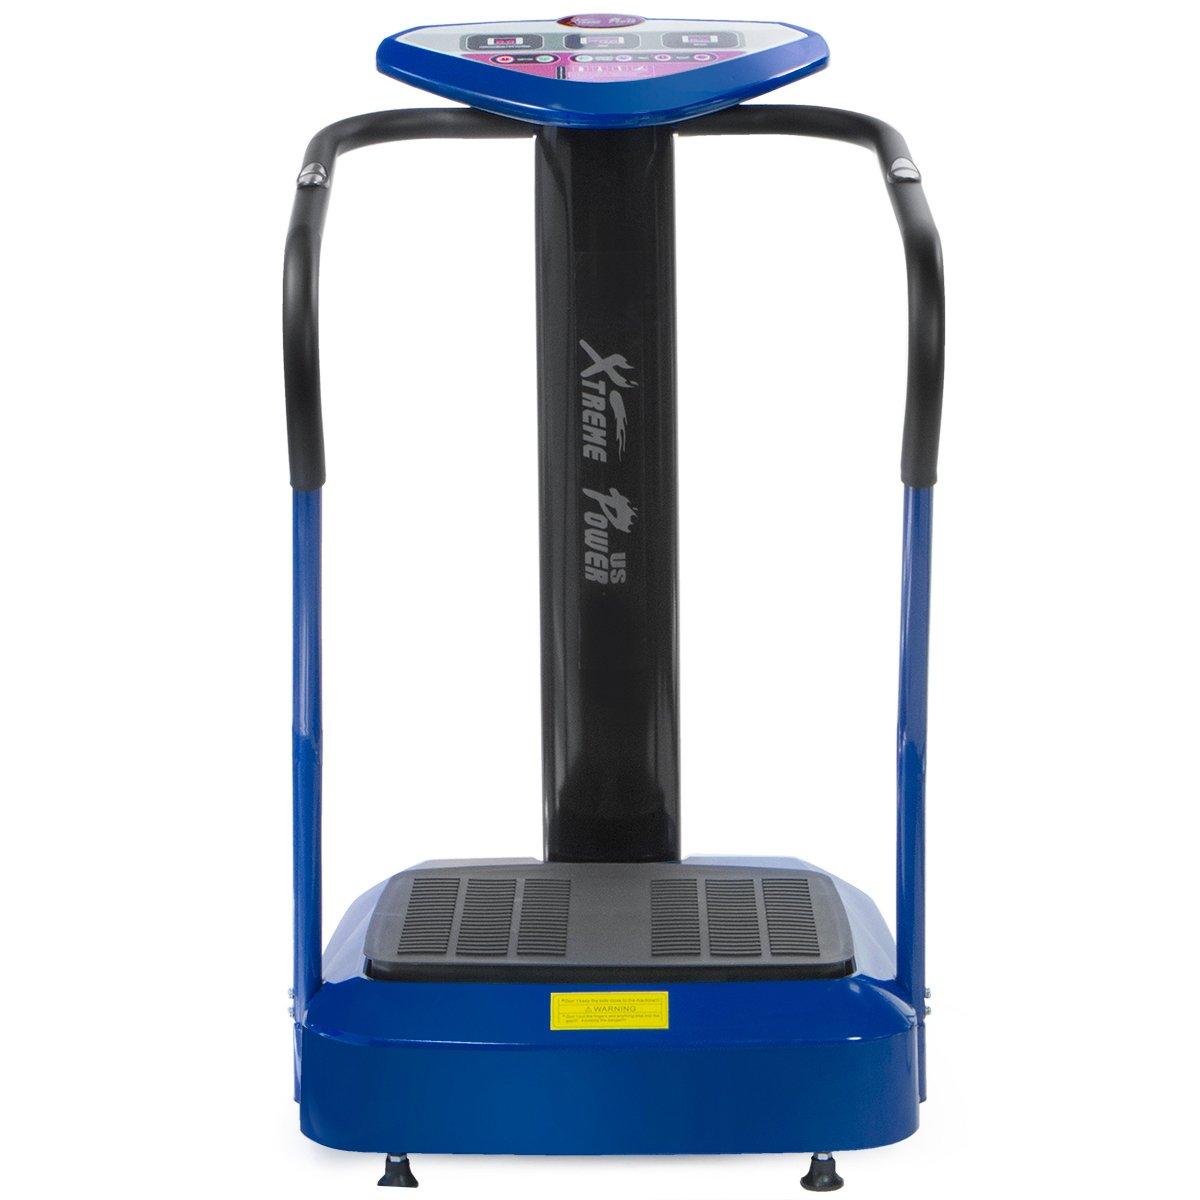 XtremepowerUS 2000W Slim Full Body Vibration Platform Exercise Crazy Fit Machine (Blue) by XtremepowerUS